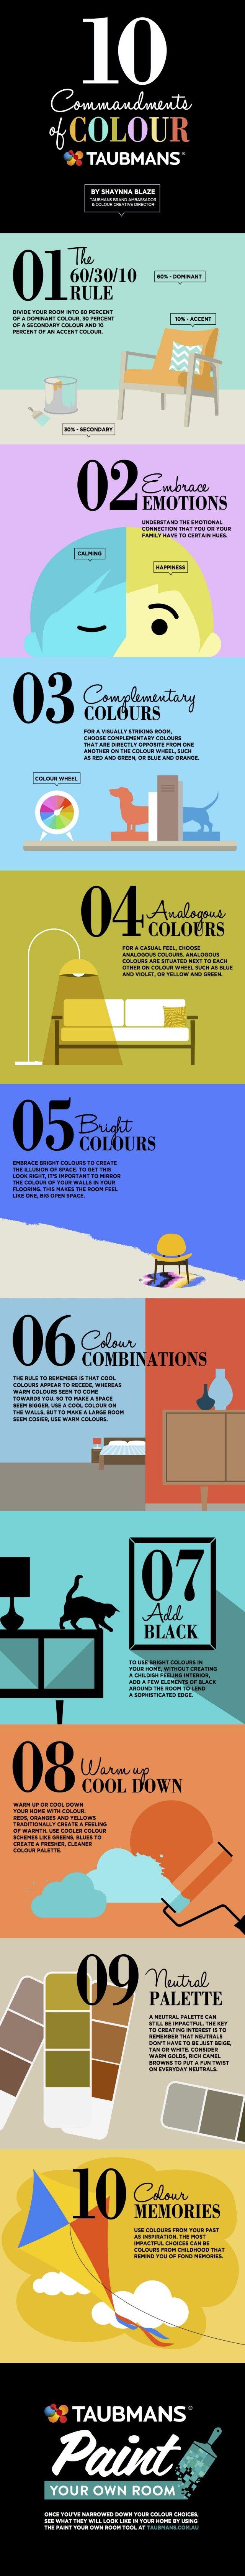 Shaynna Blaze's 10 Commandments of Colour